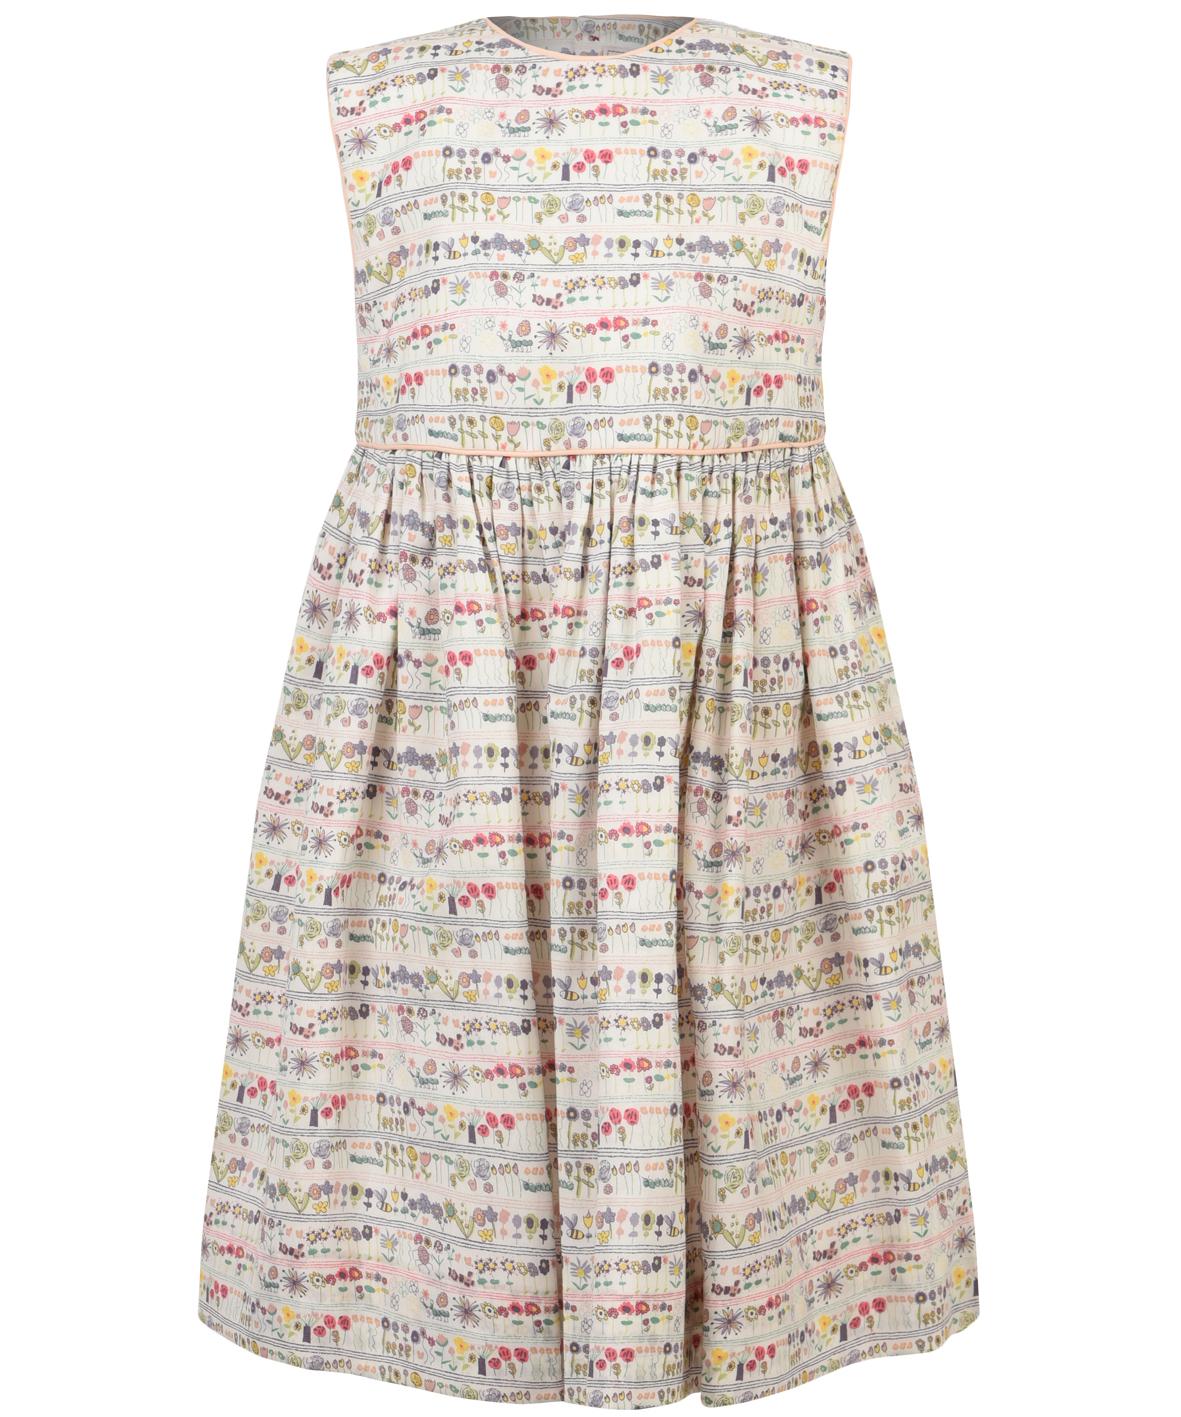 b0018a628682 Classic Hattie Dress - Jolie Rose Liberty Print